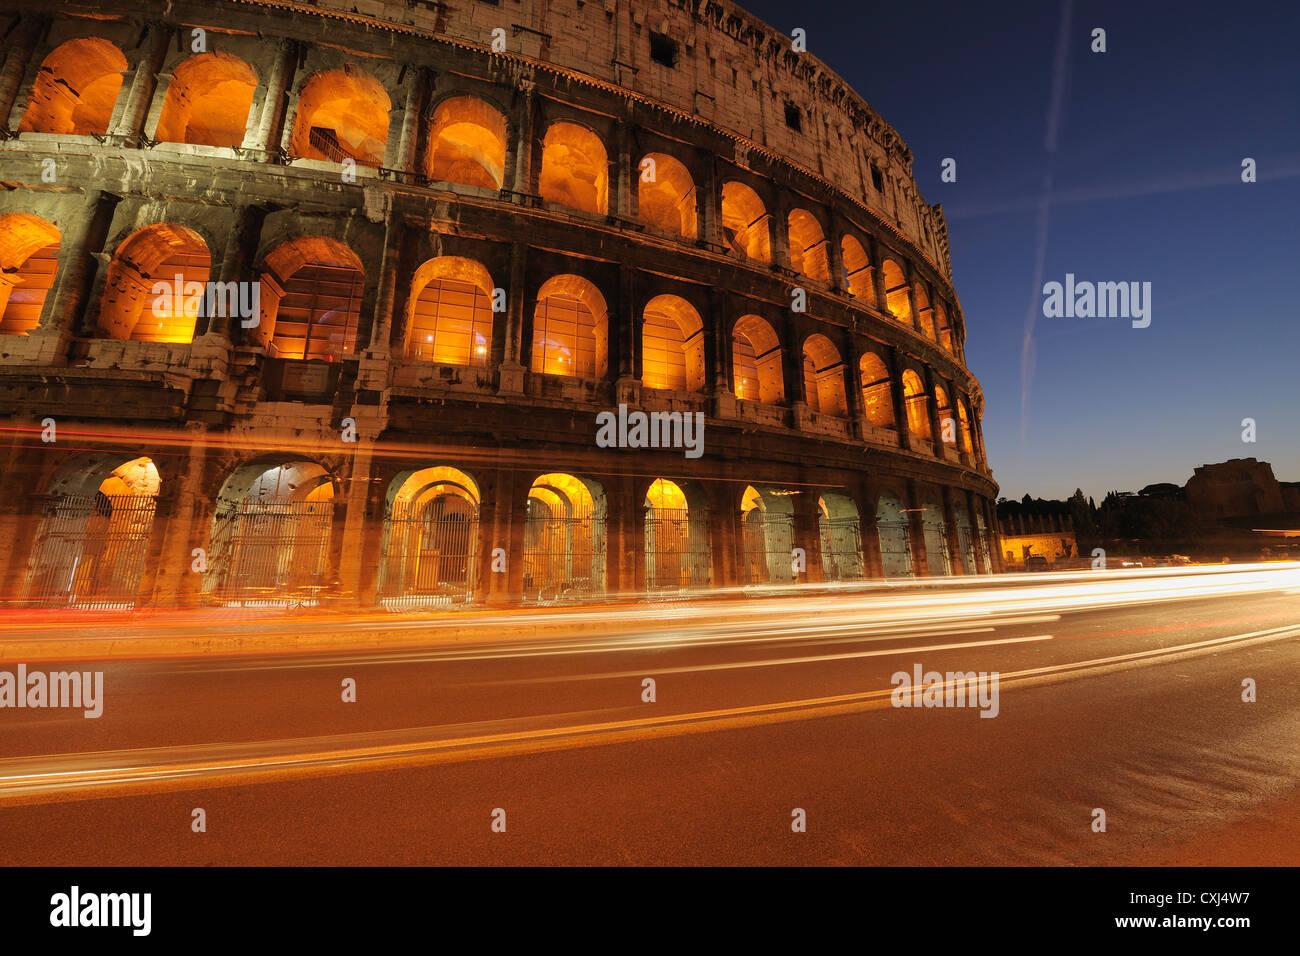 Europa, Italia, Roma, Vista del coliseo en la noche Imagen De Stock